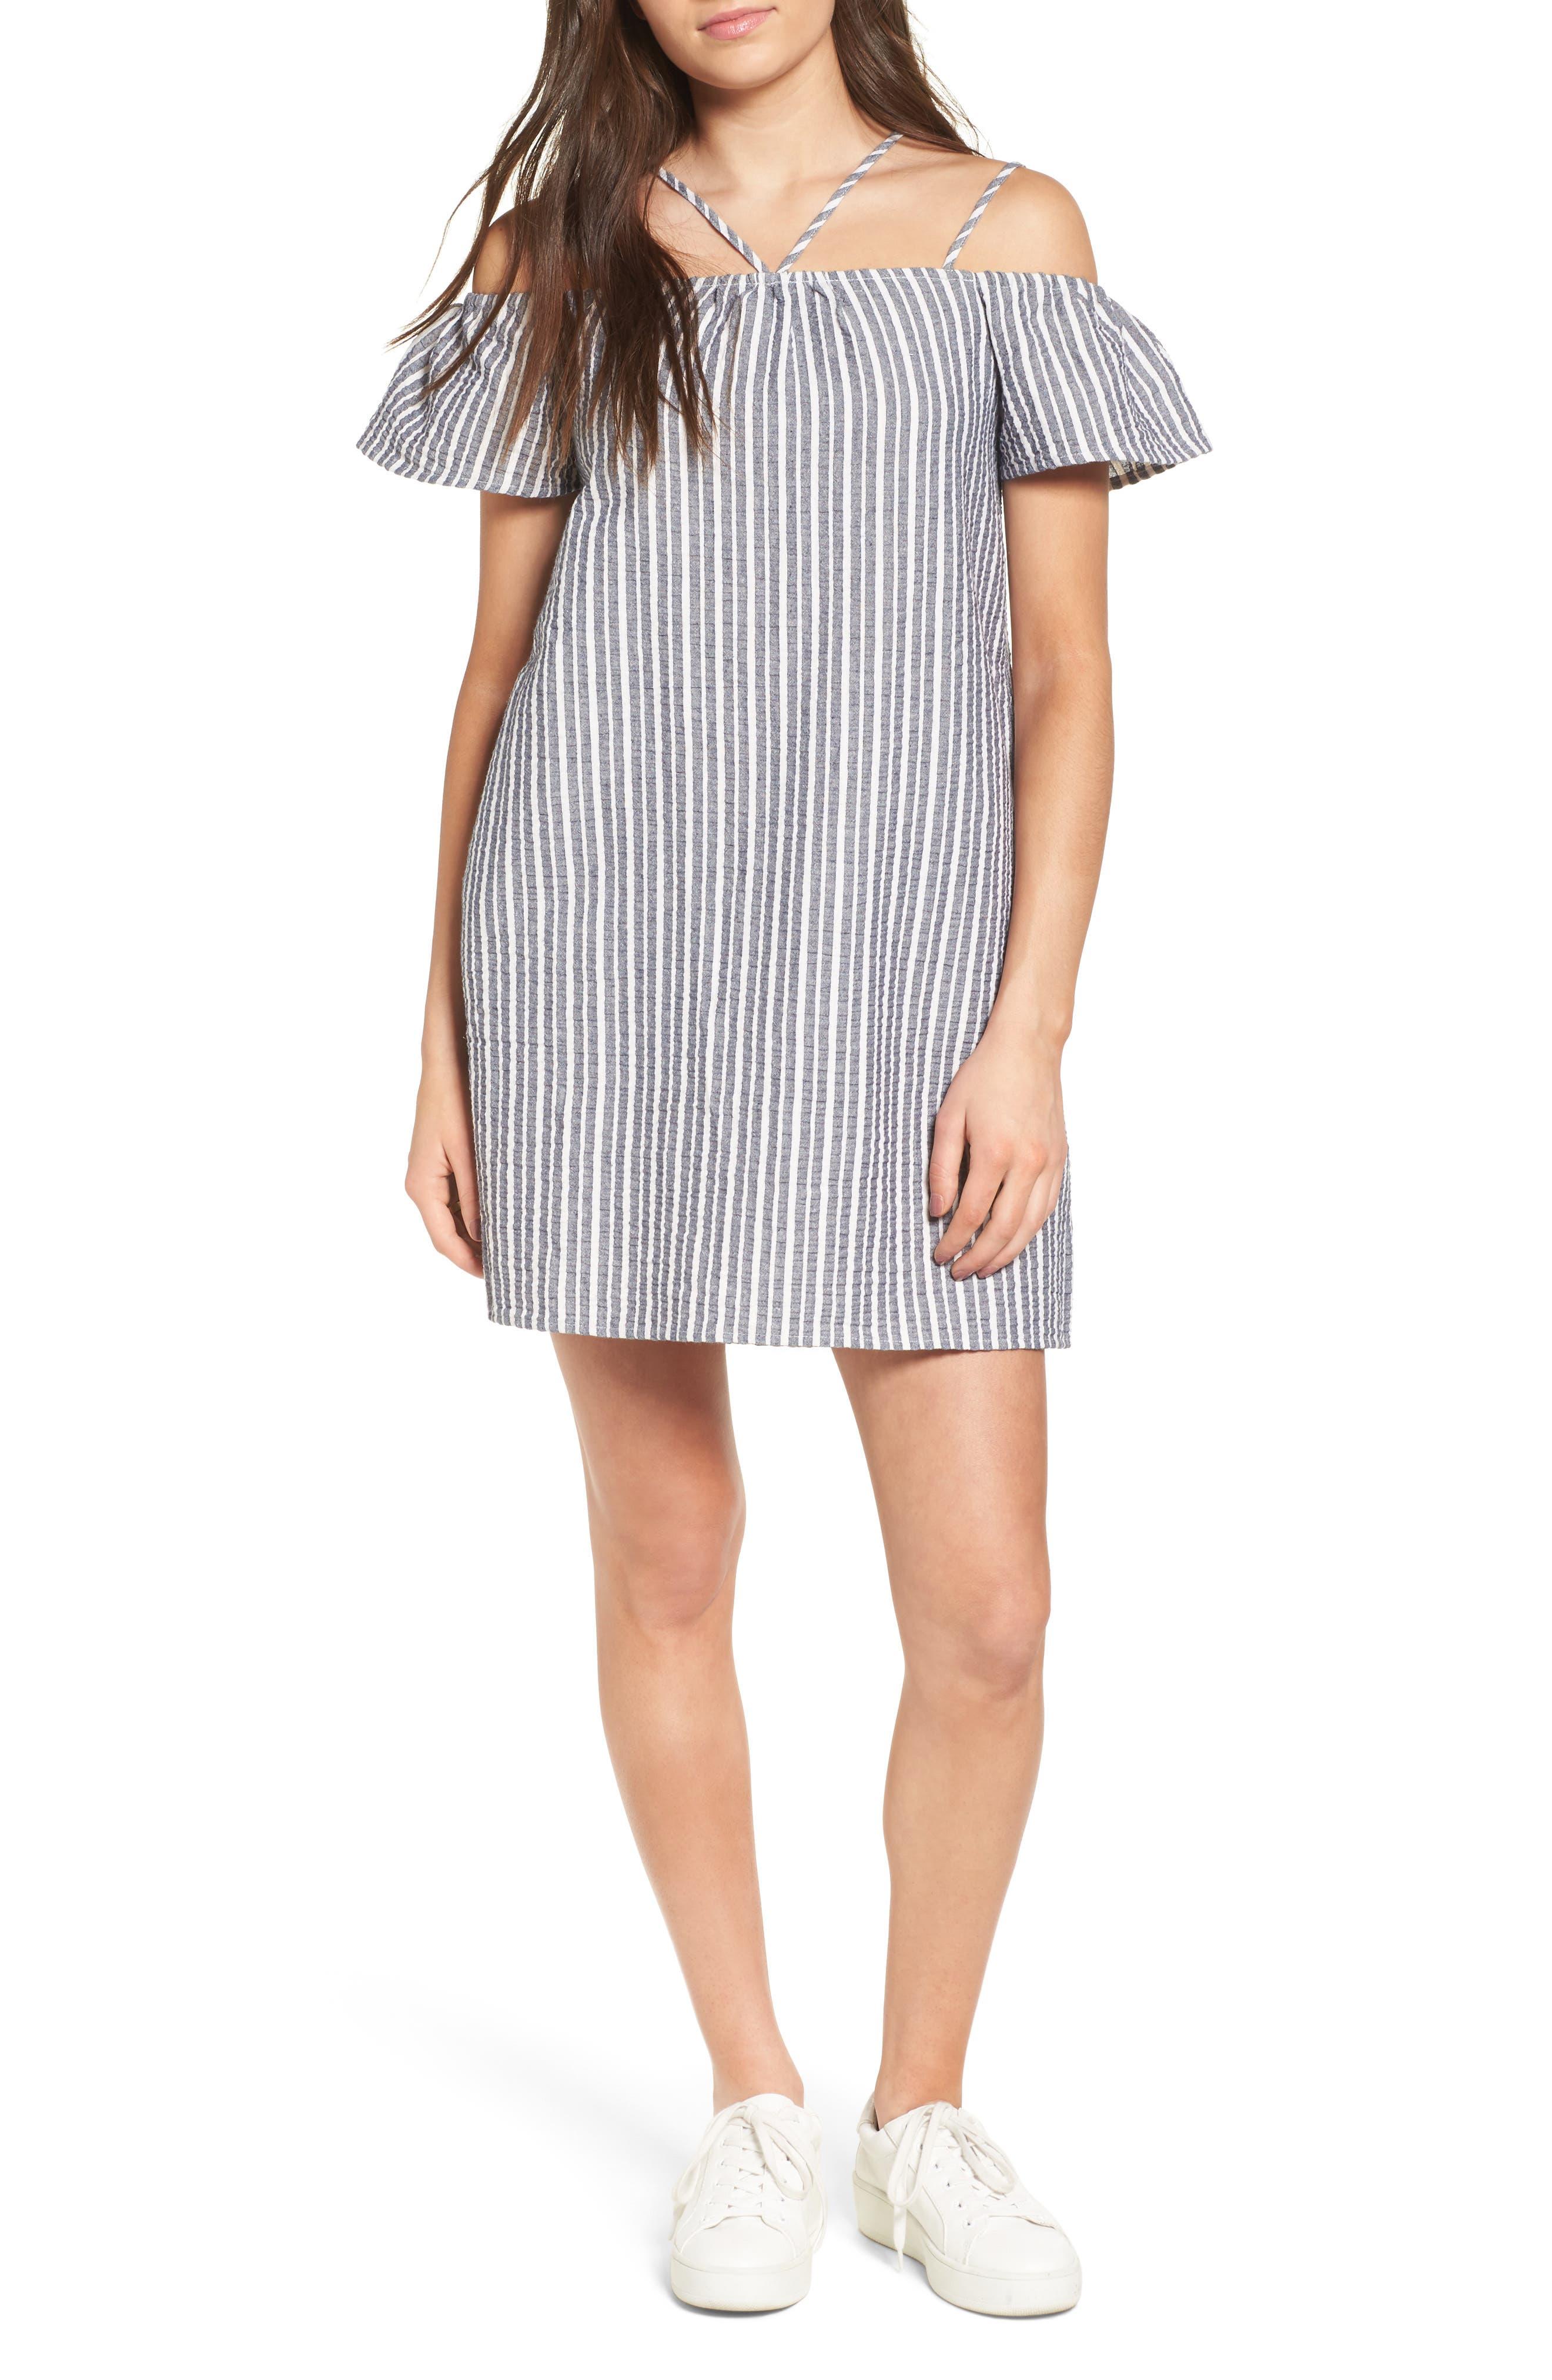 Main Image - Lush Stripe Off the Shoulder Dress